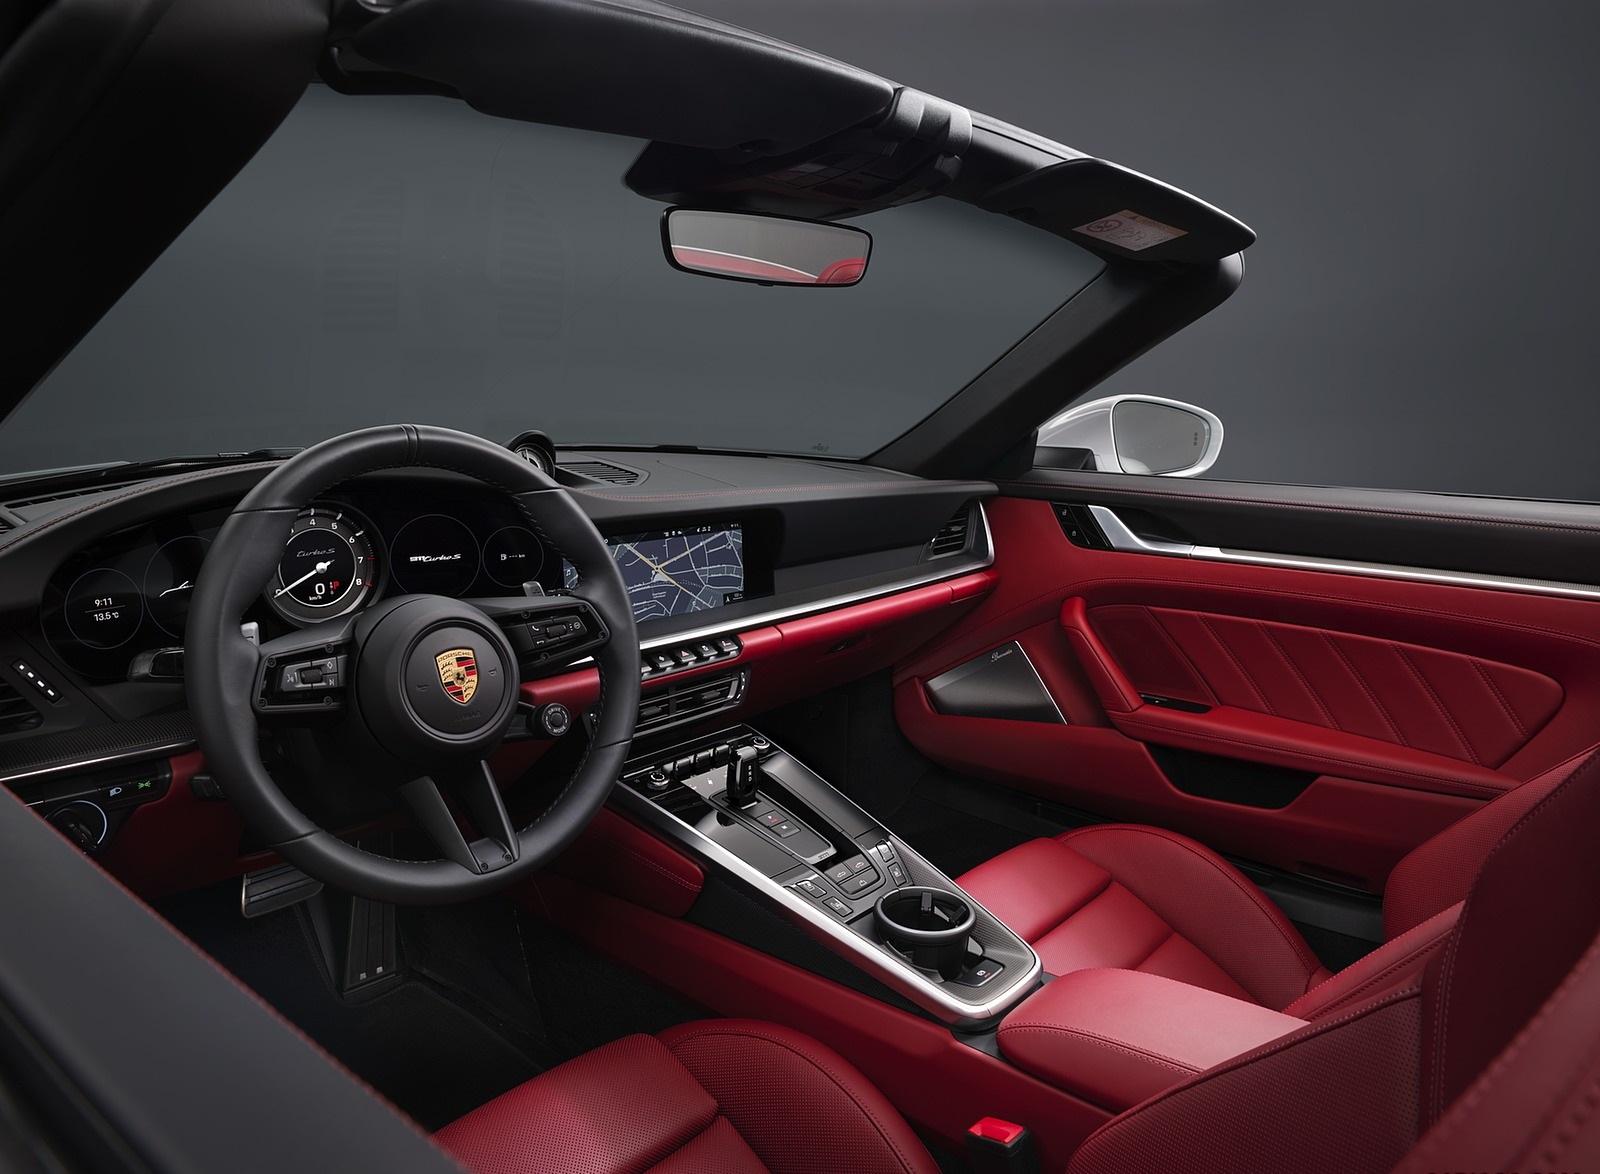 2021 Porsche 911 Turbo S Cabriolet Interior Wallpapers (8)